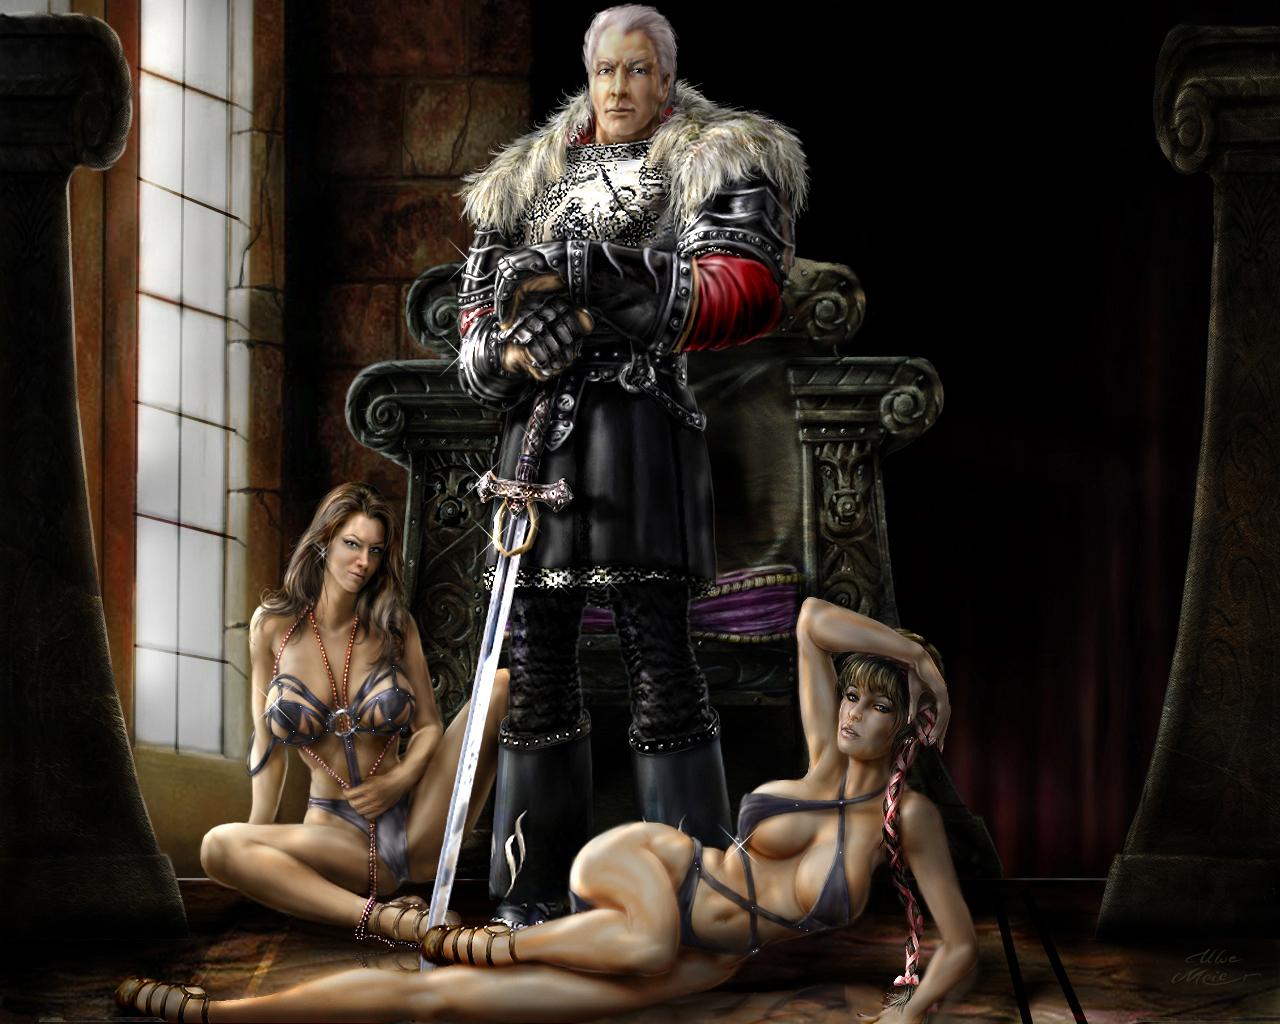 Baron with enslaved women